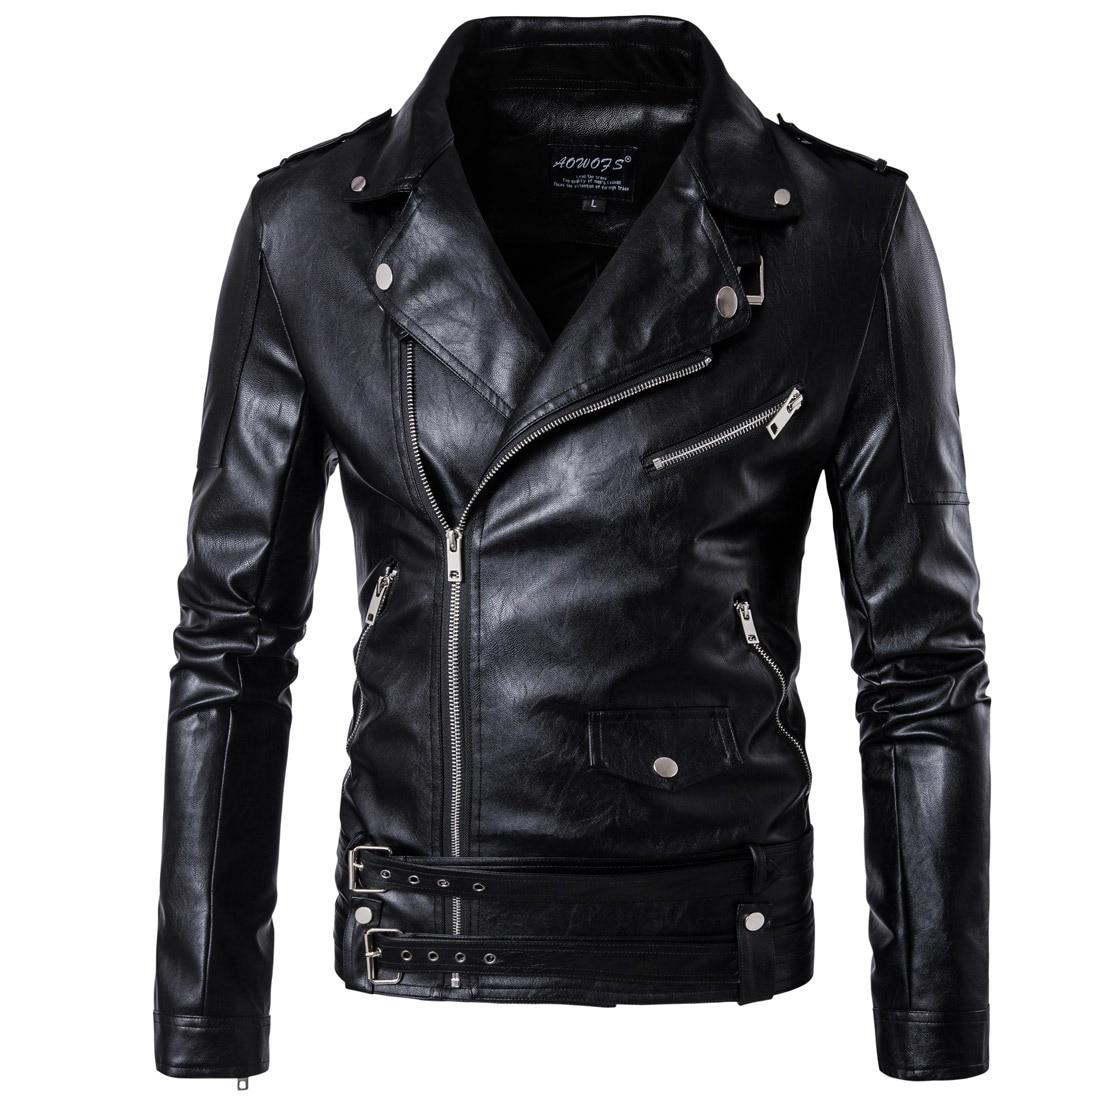 MarKyi 2017 fashion luxury motorcycle men leather jacket good quality men leather jackets and coats plus size slim fit